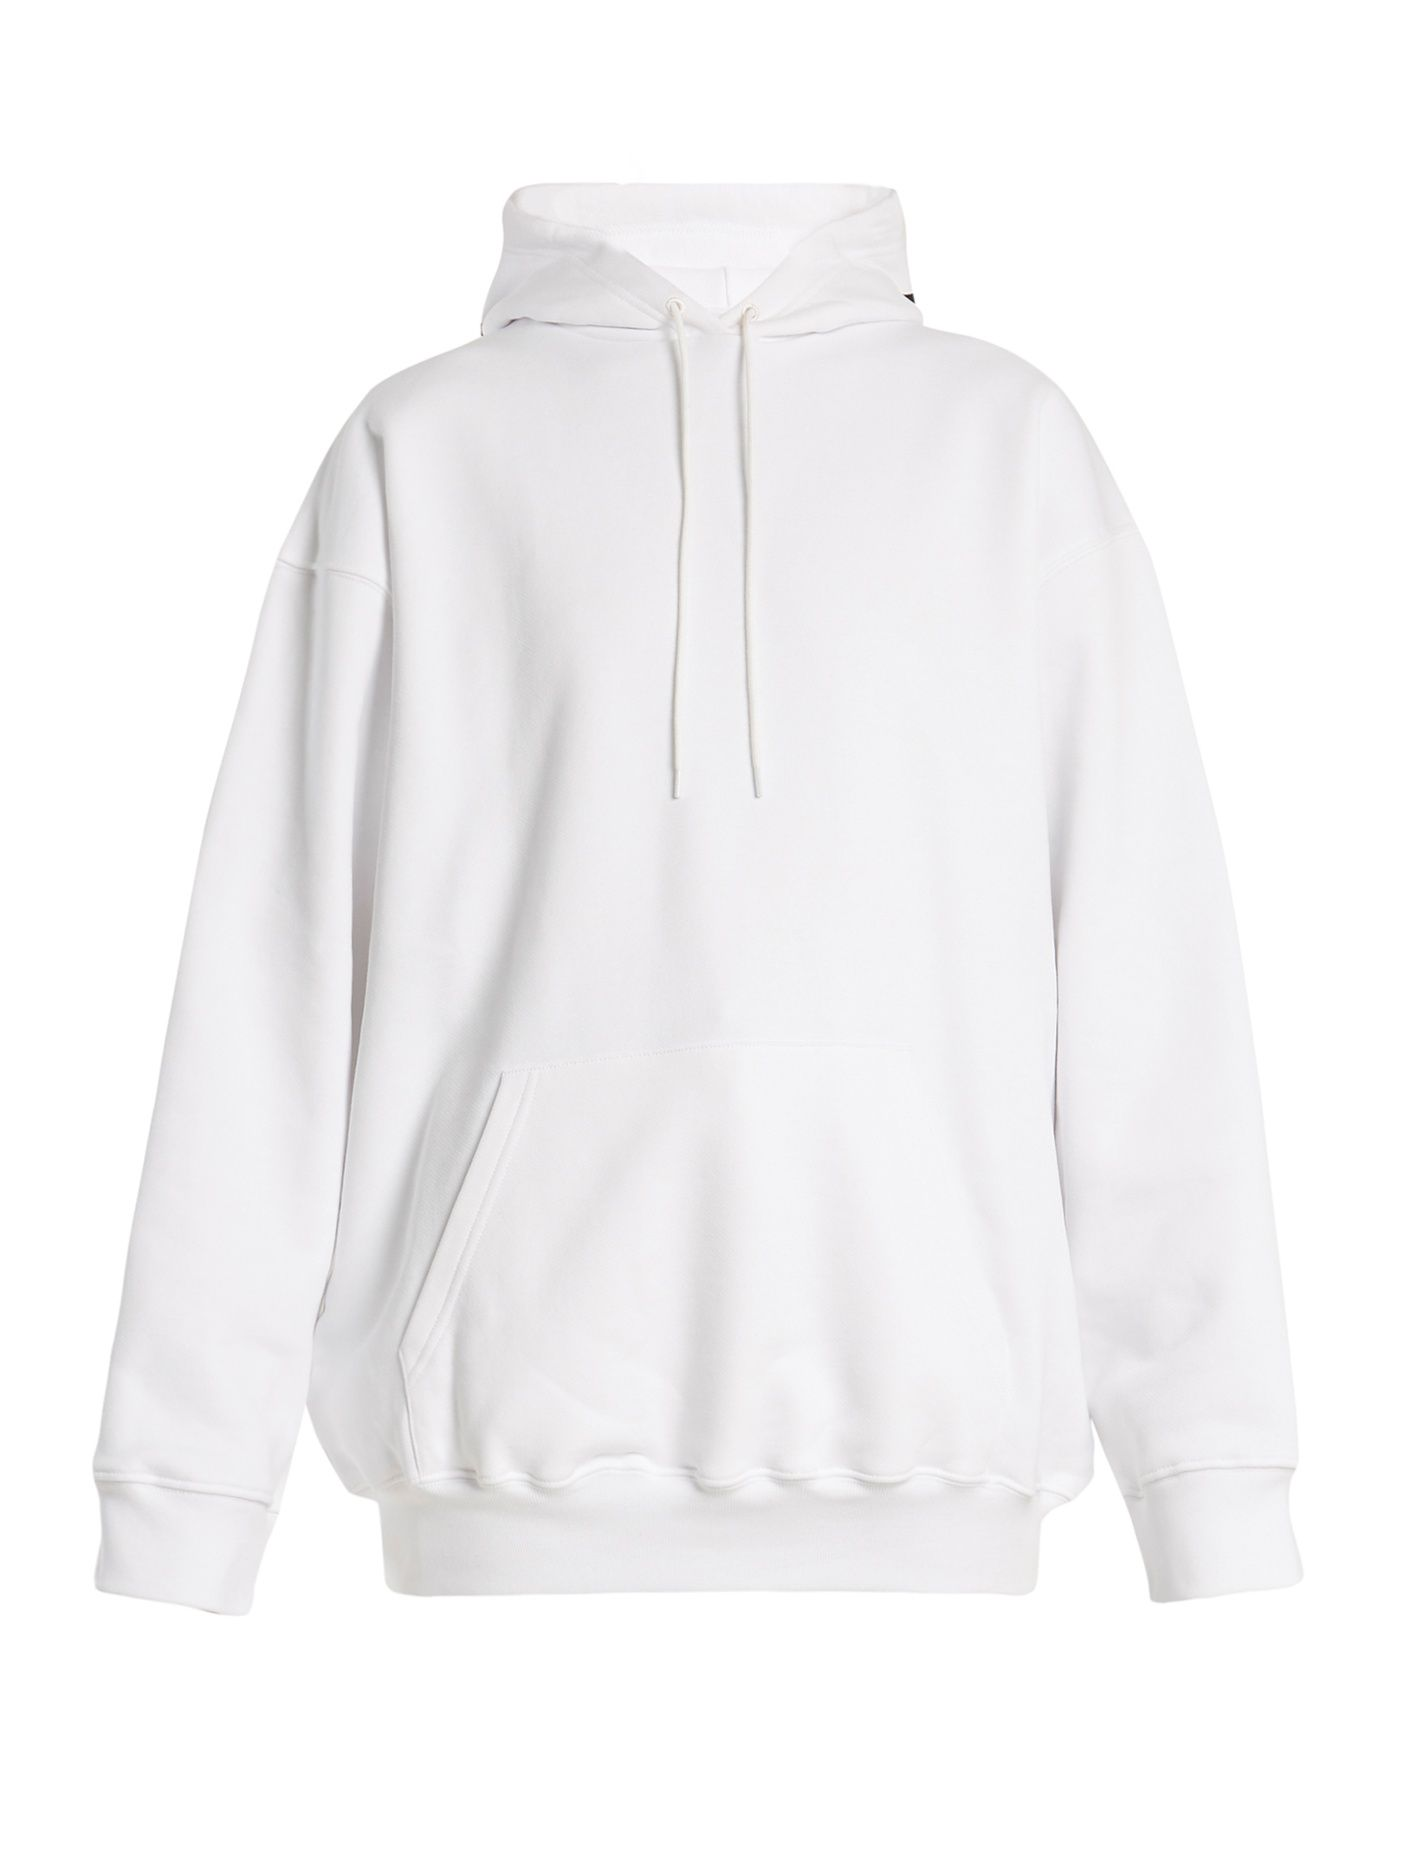 Balenciaga Hoodie Sweater At Matchesfashion Com Oversized White Hoodie White Hoodie Women Sweater Hoodie [ 1871 x 1403 Pixel ]